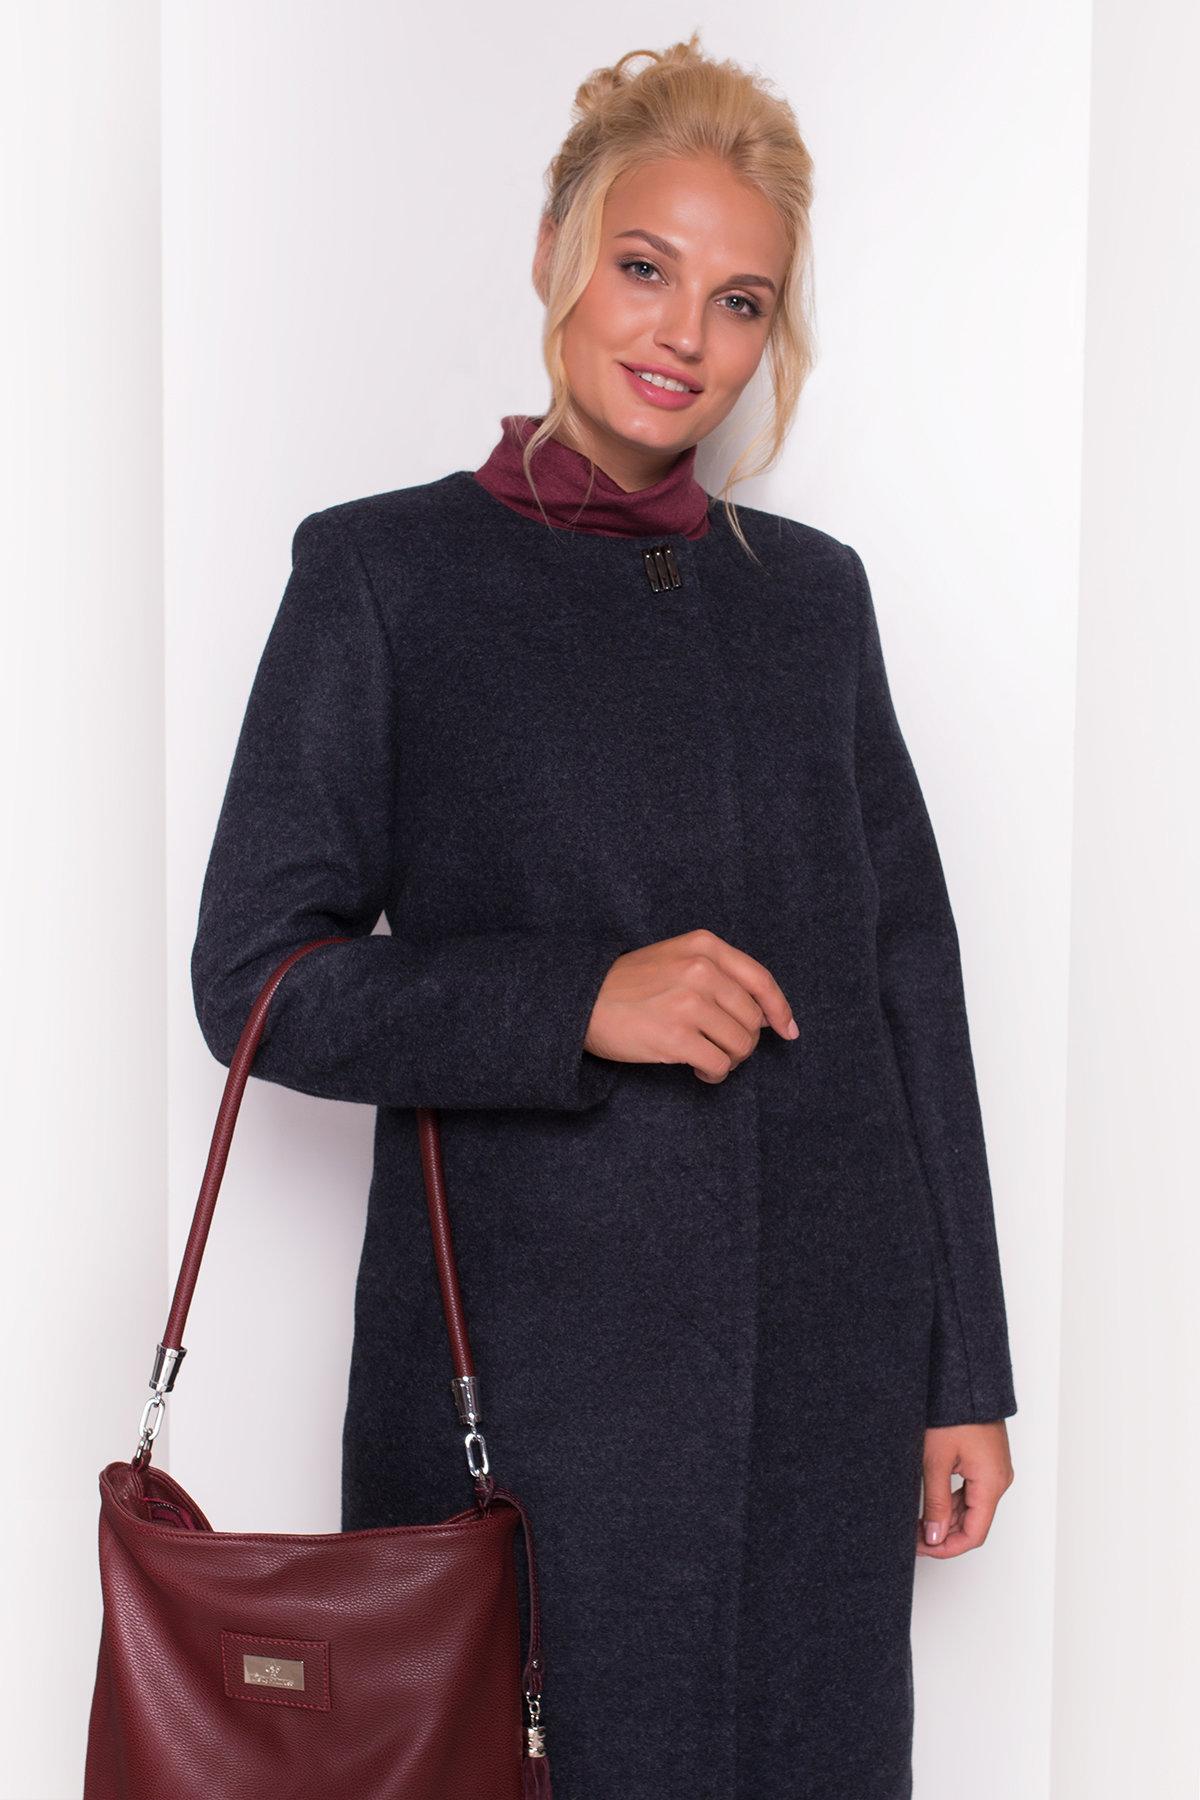 Пальто Фортуна лайт Donna 4464 АРТ. 21360 Цвет: Темно-синий - фото 3, интернет магазин tm-modus.ru